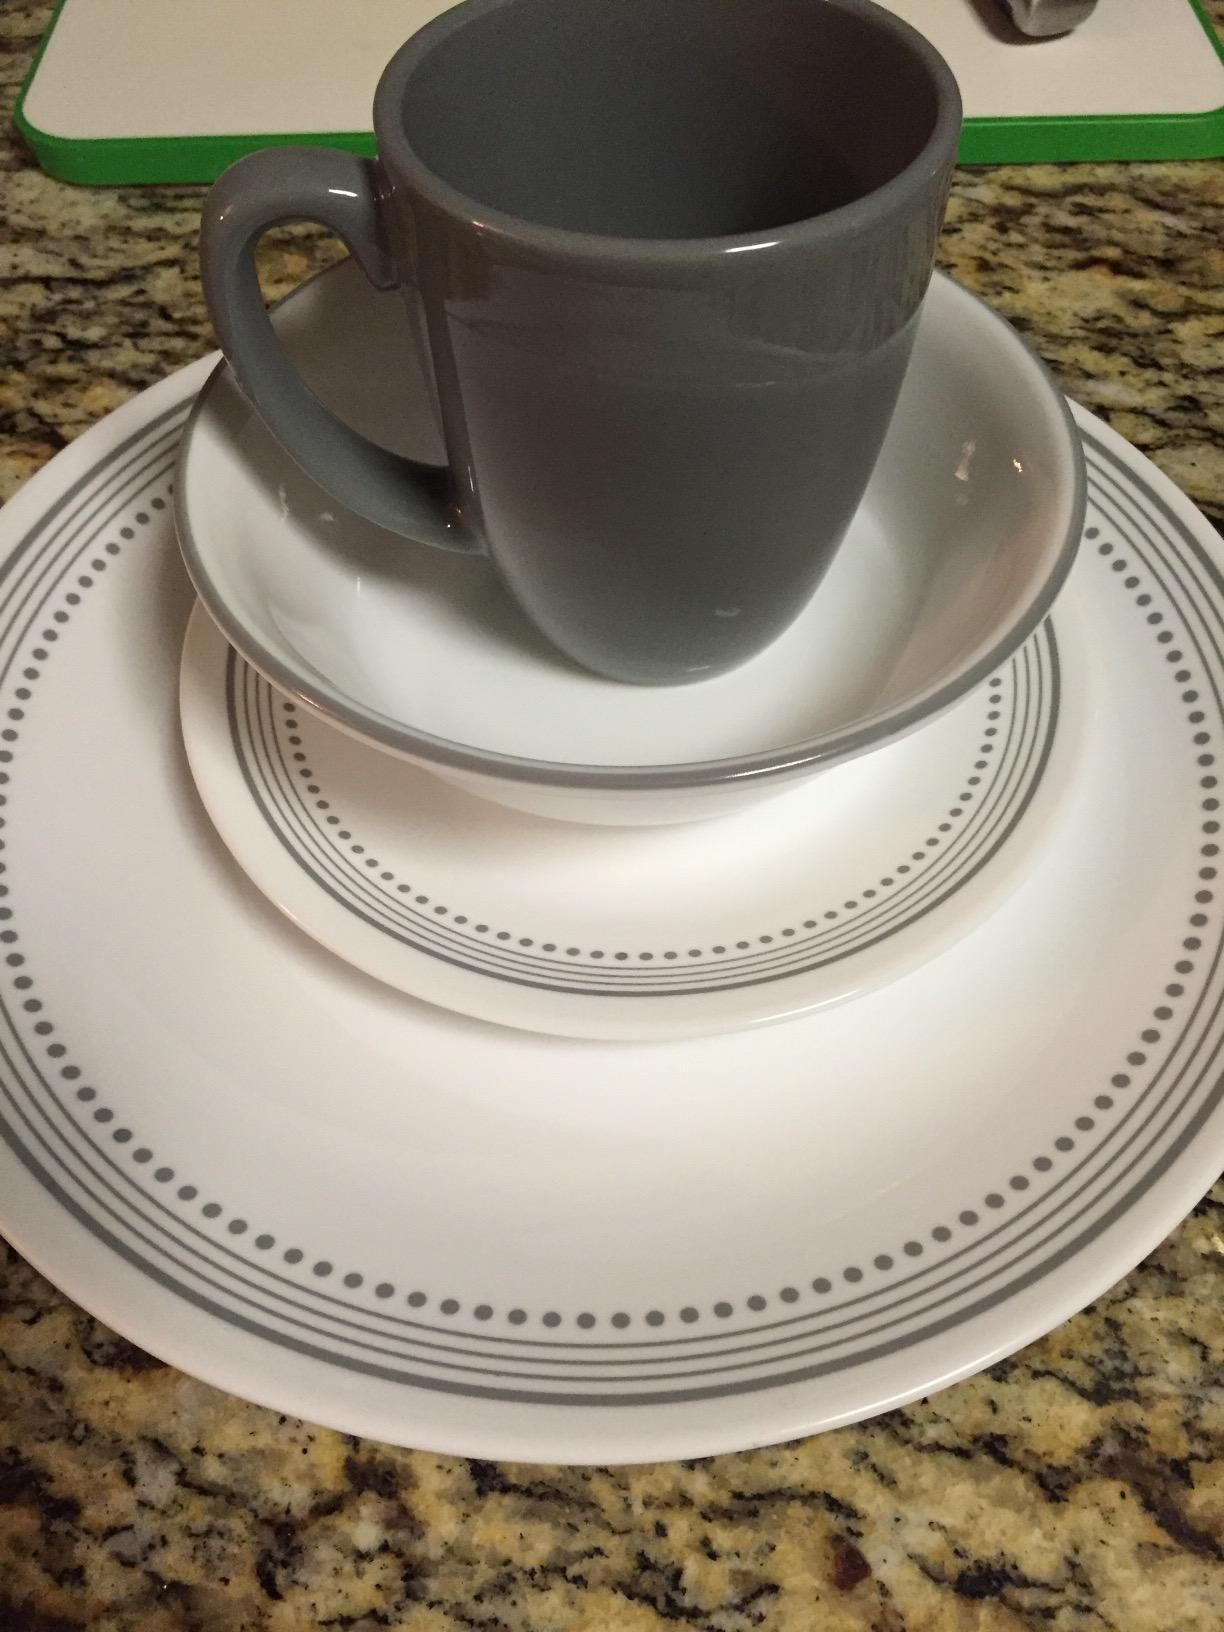 Amazon.com Corelle Livingware 16-Piece Dinnerware Set Mystic Gray Service & Amazon.com: Corelle Livingware 16-Piece Dinnerware Set Mystic Gray ...